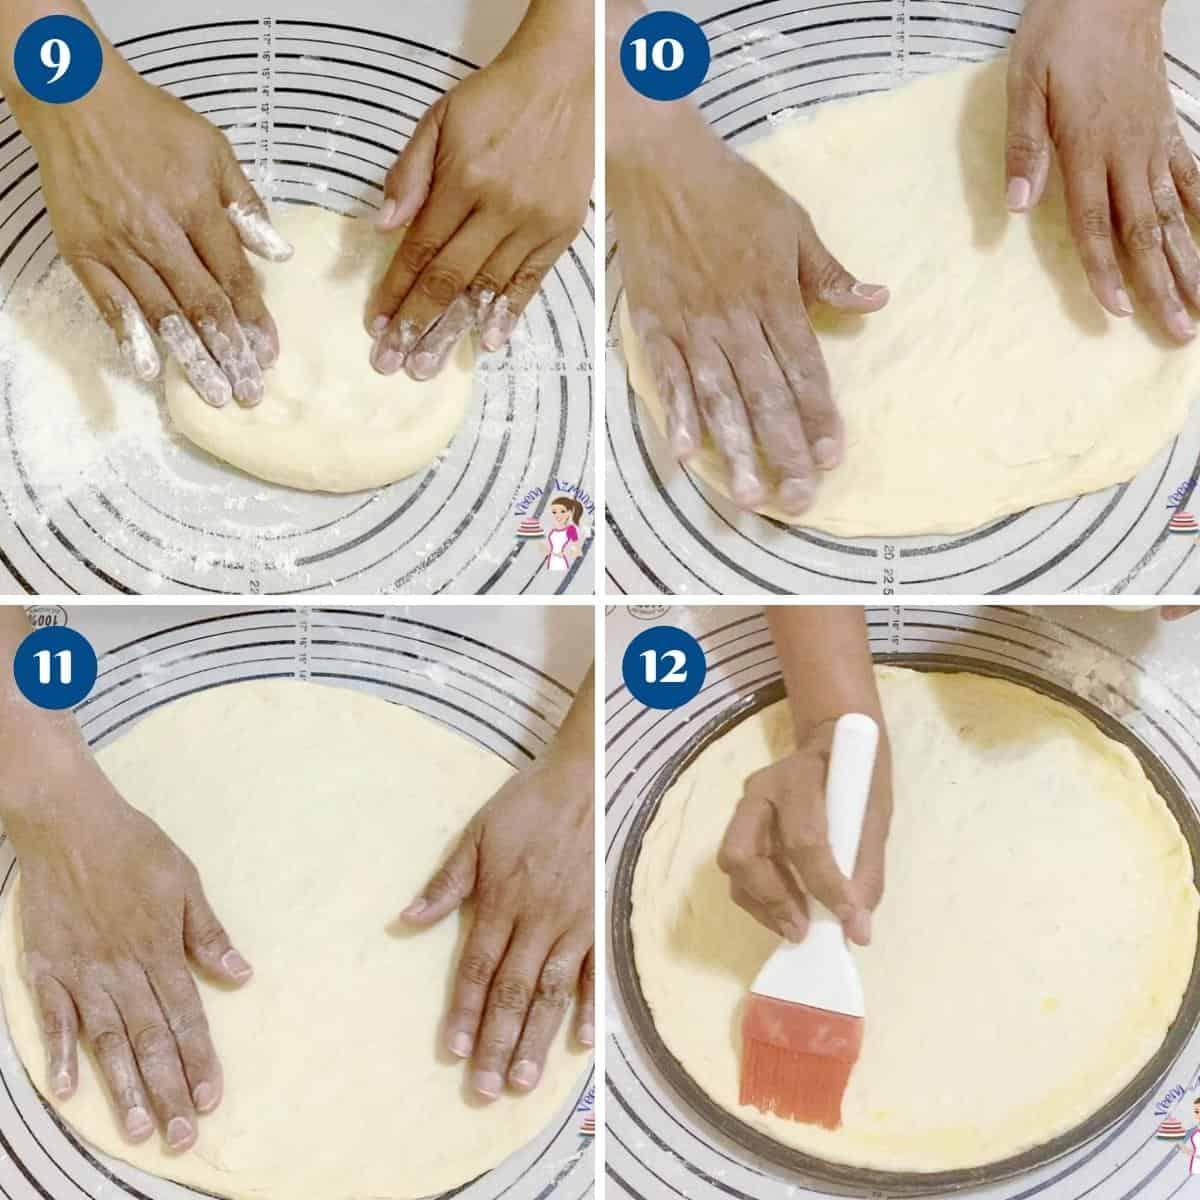 Progress pictures rolling pizza dough.